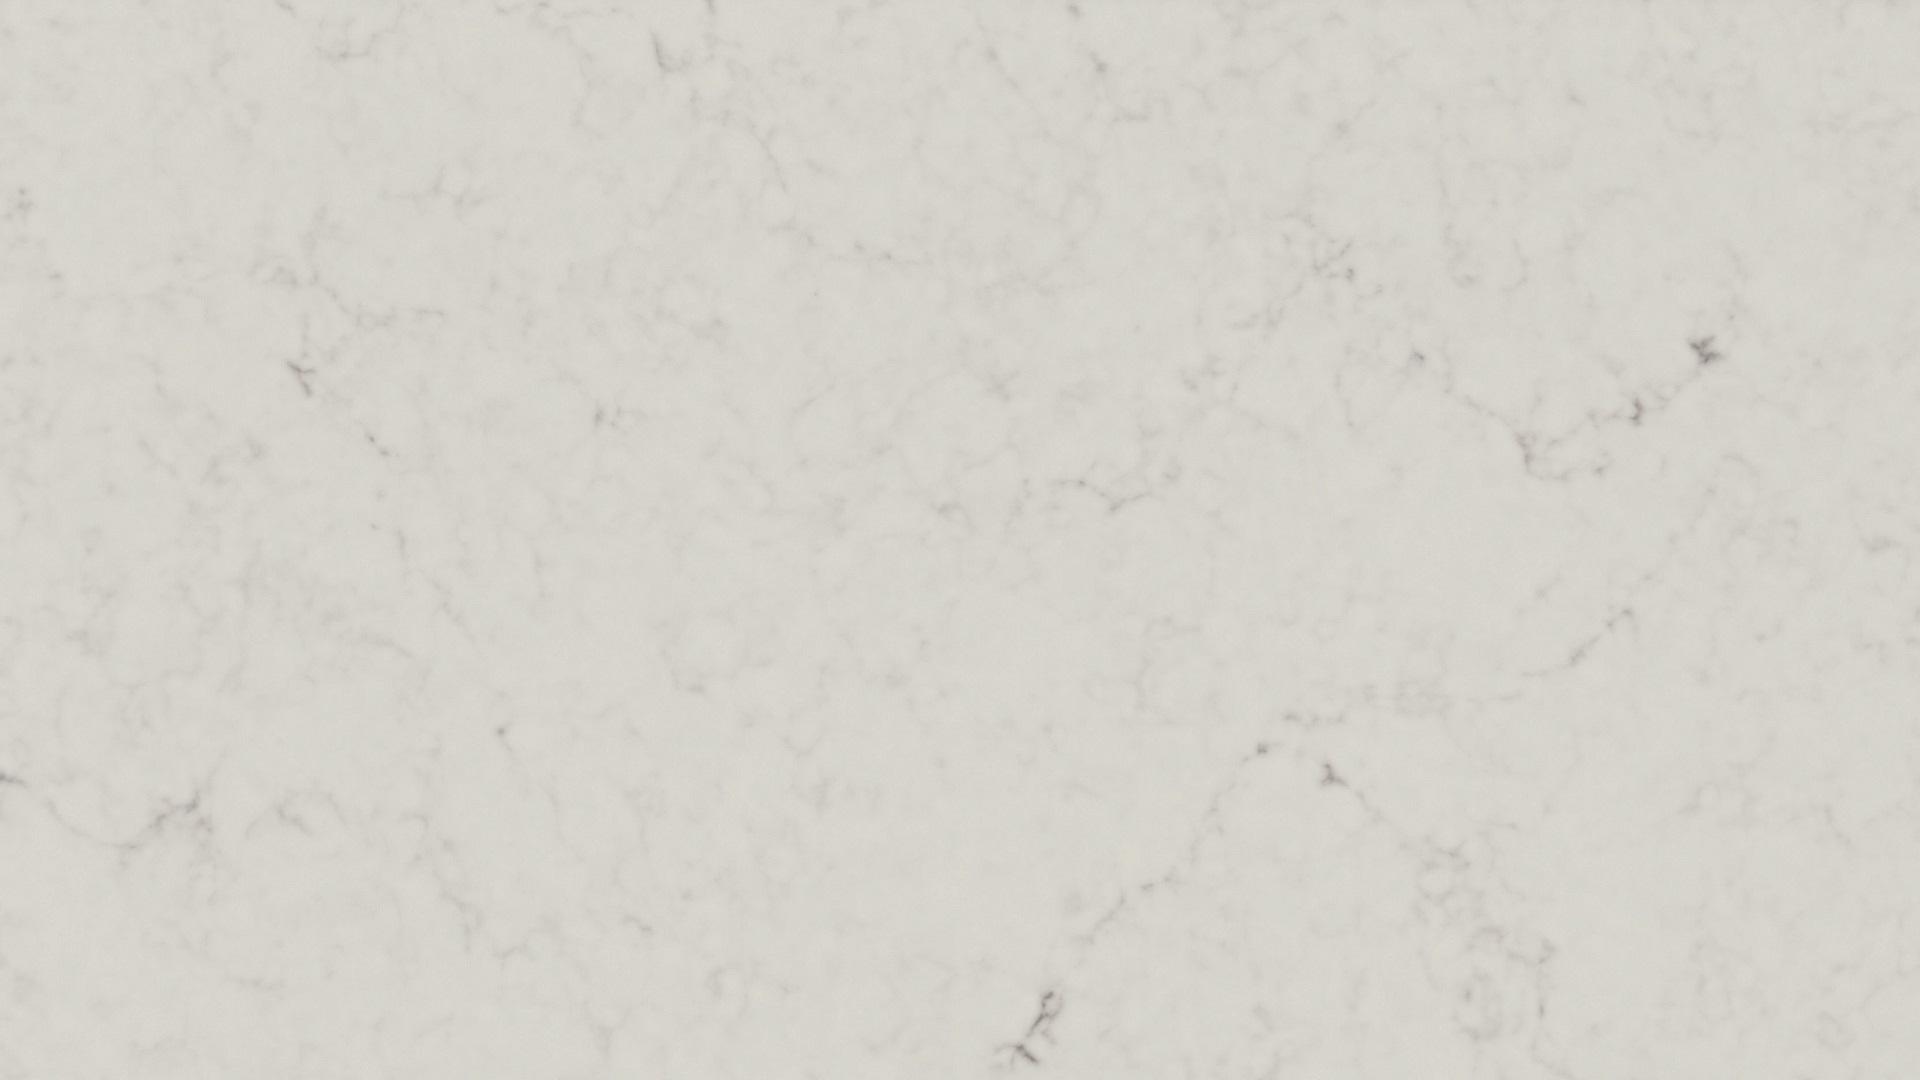 Quartz Countertop Color Selector Euro Stone Craft Caesarstone London Grey Honed QuartzEuro